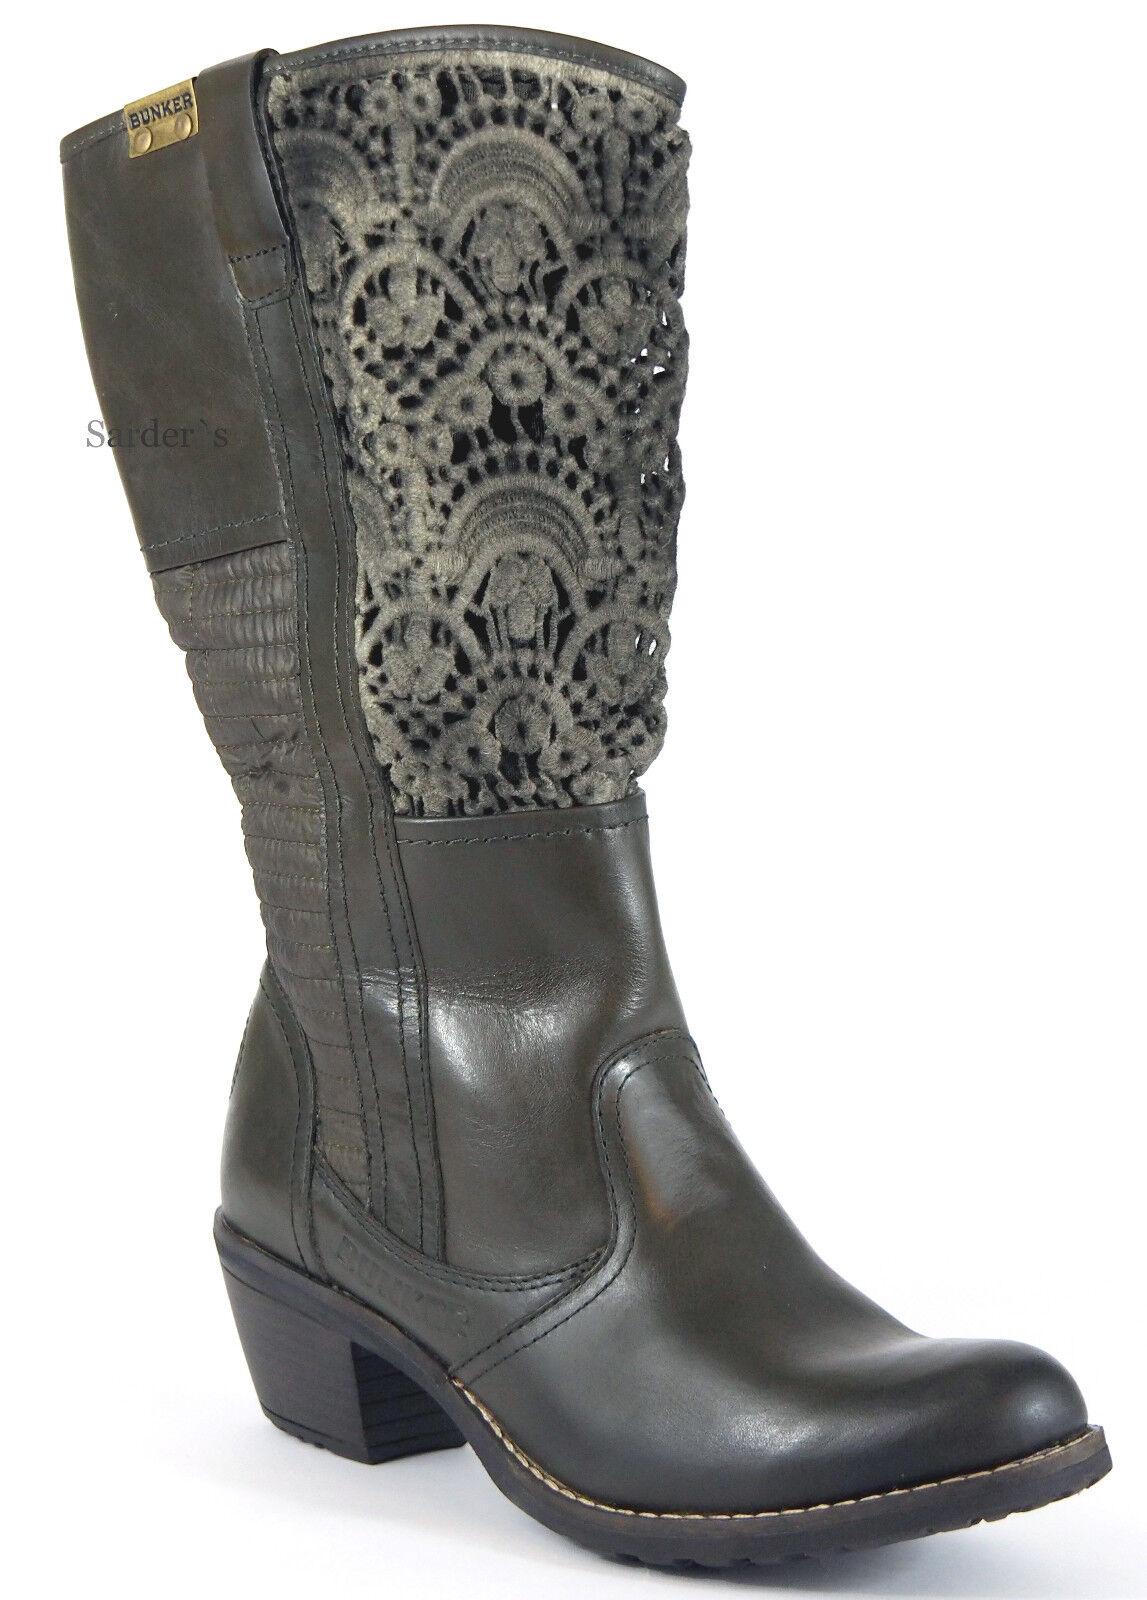 BUNKER Stiefel 39 Nappa LEDER Khaki Stiefelette Häkel Cowboy Absatz Stiefel NEU